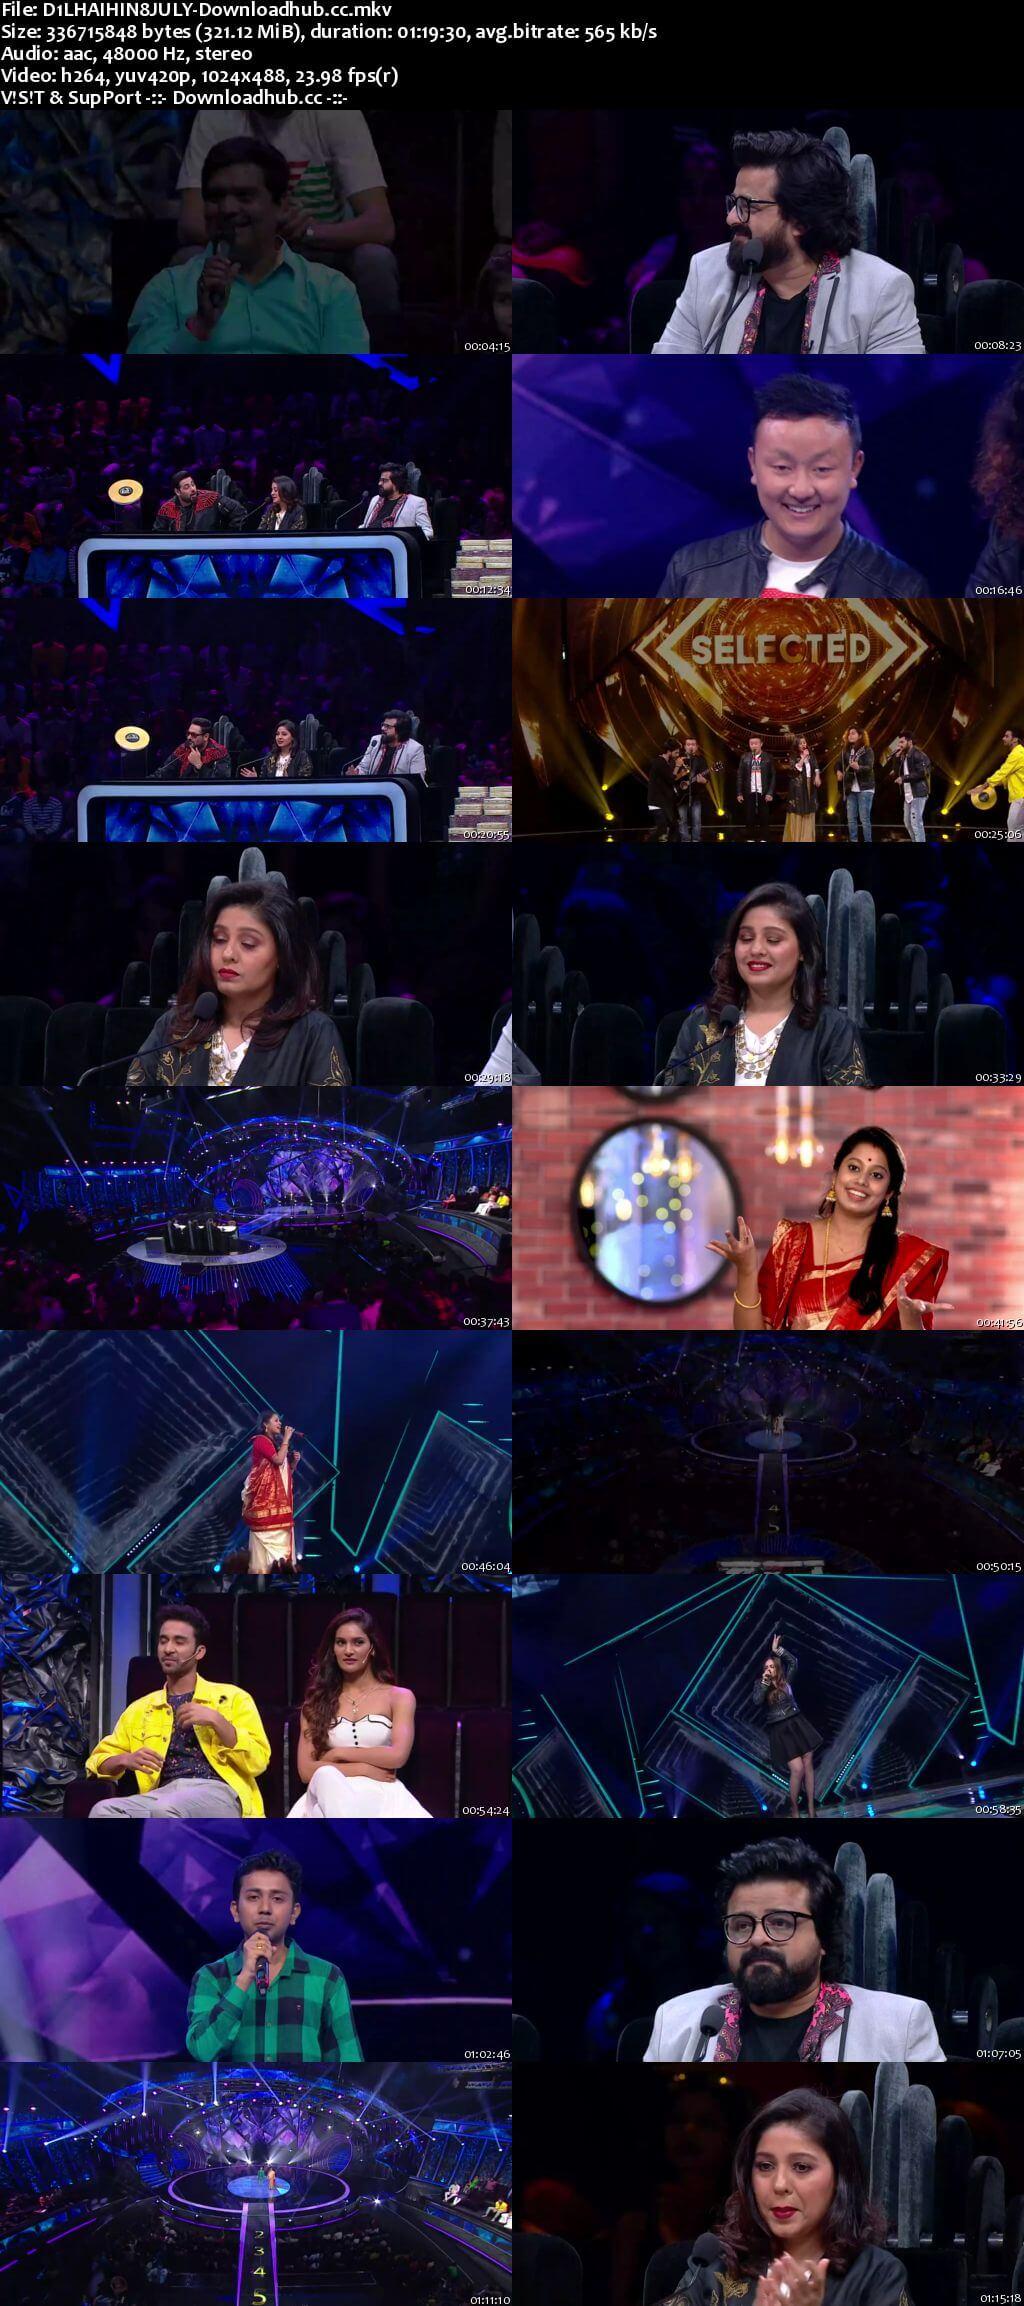 Dil Hai Hindustani 2 08 July 2018 Episode 02 HDTV 480p